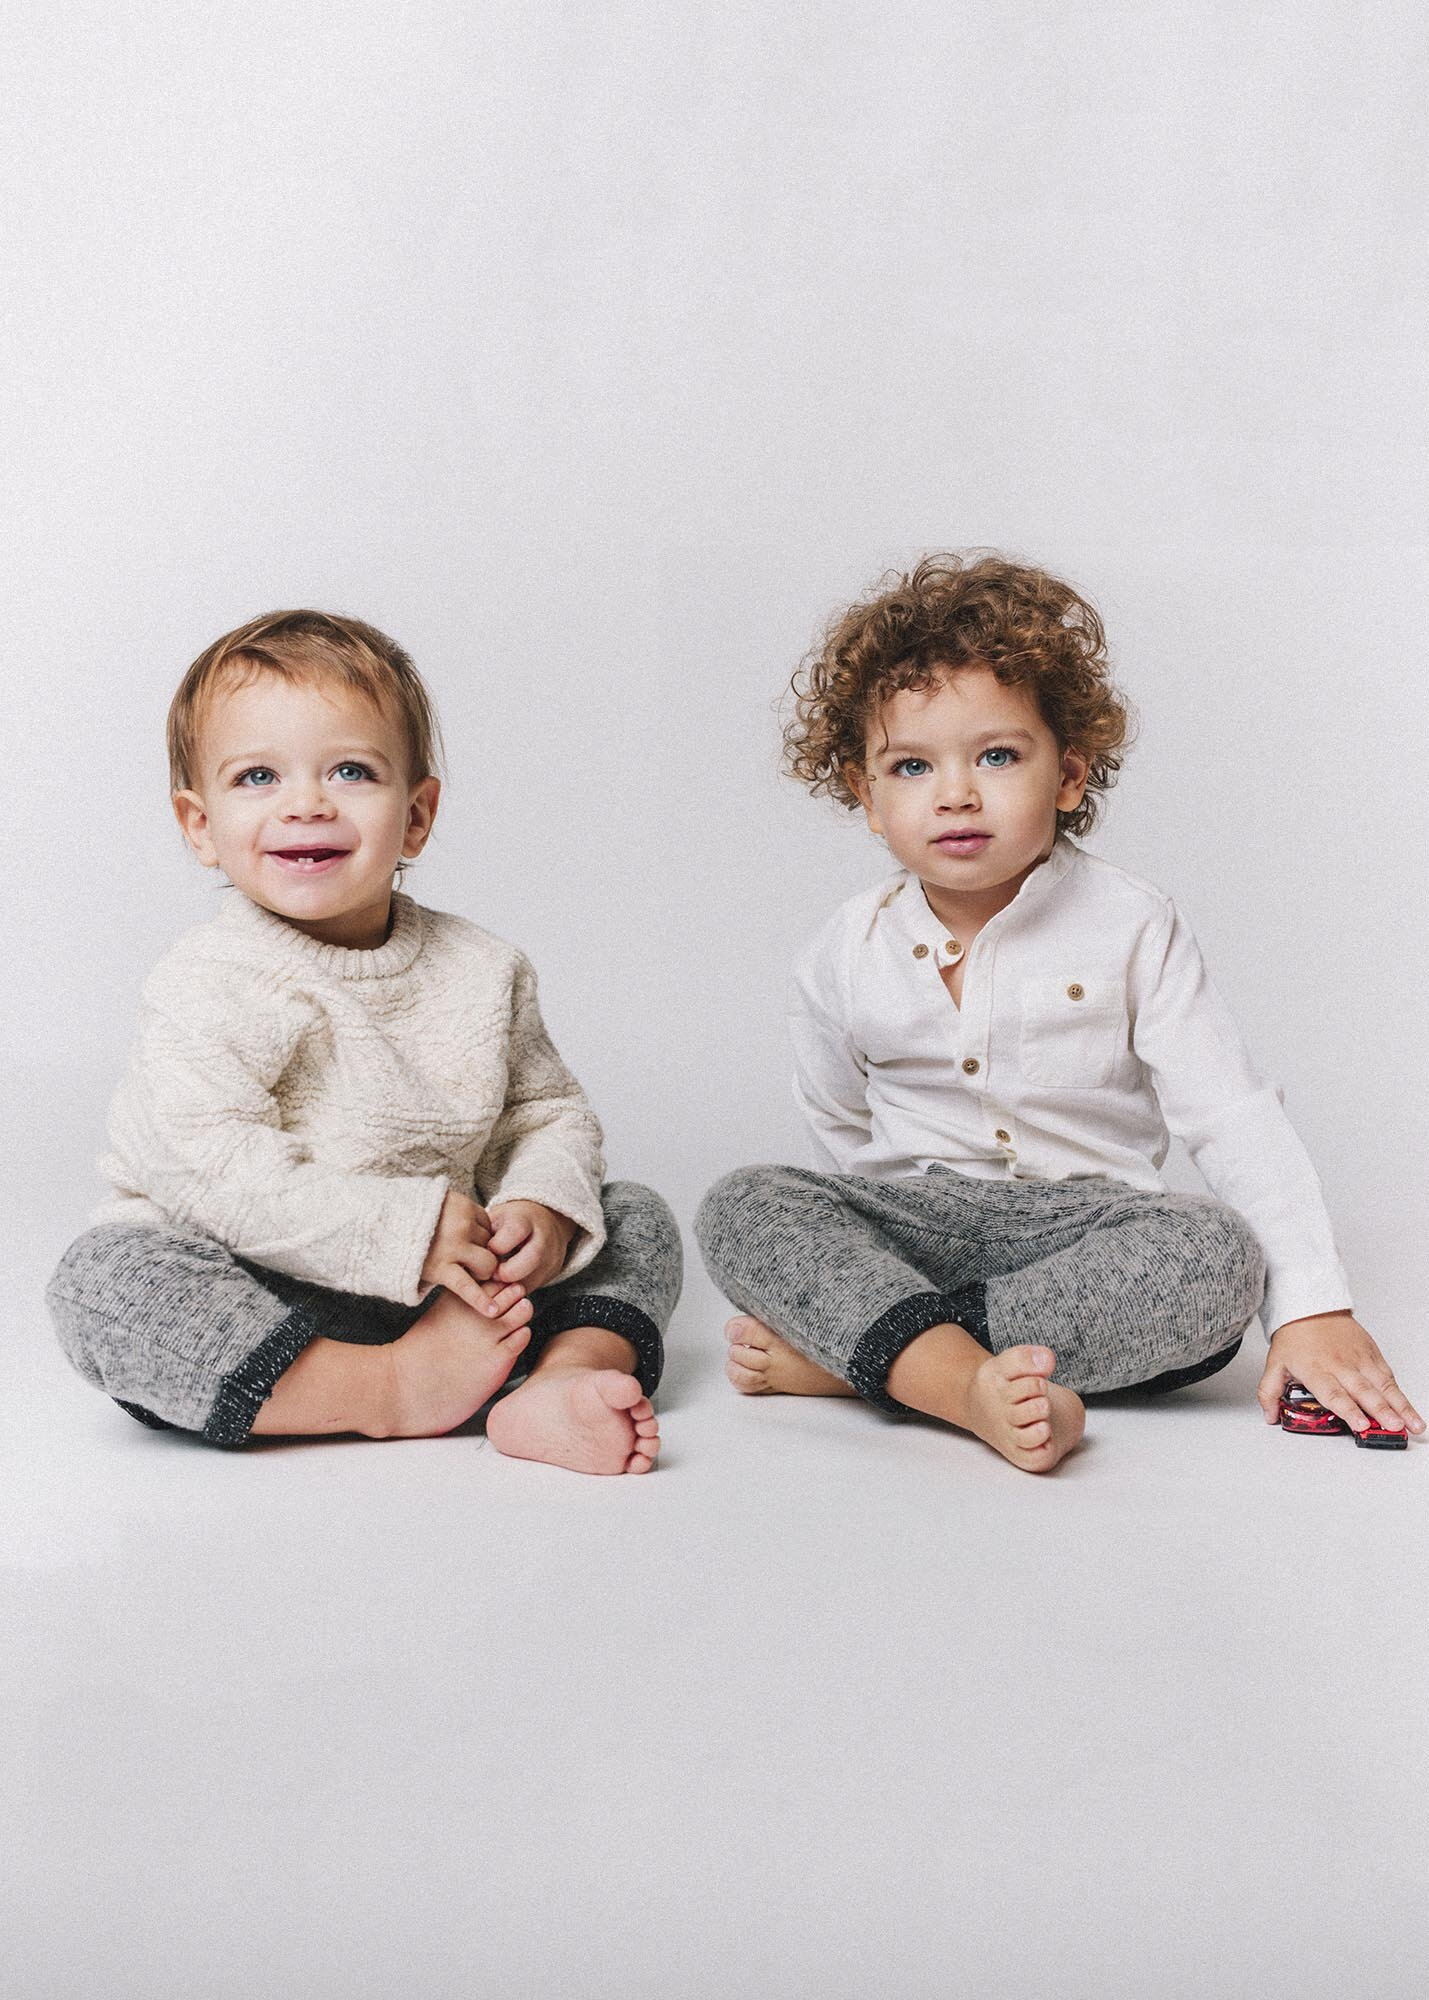 nyc-photographers-baby-modeling-nyc-10006.jpg